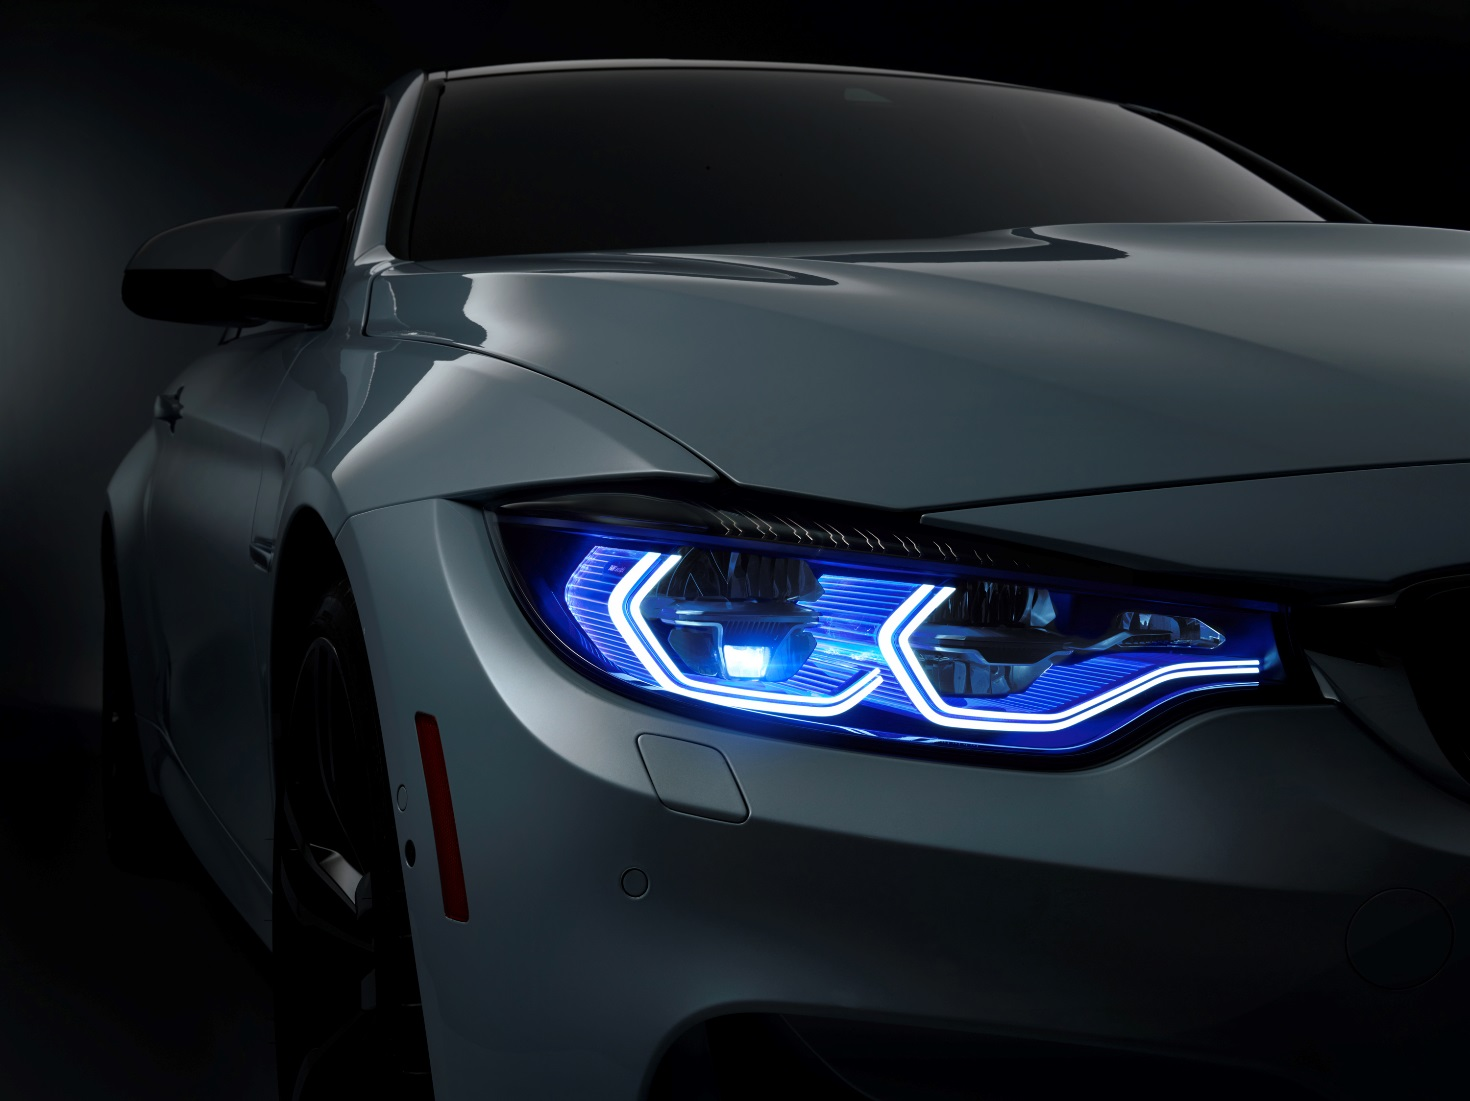 Bmw Adaptive Headlights